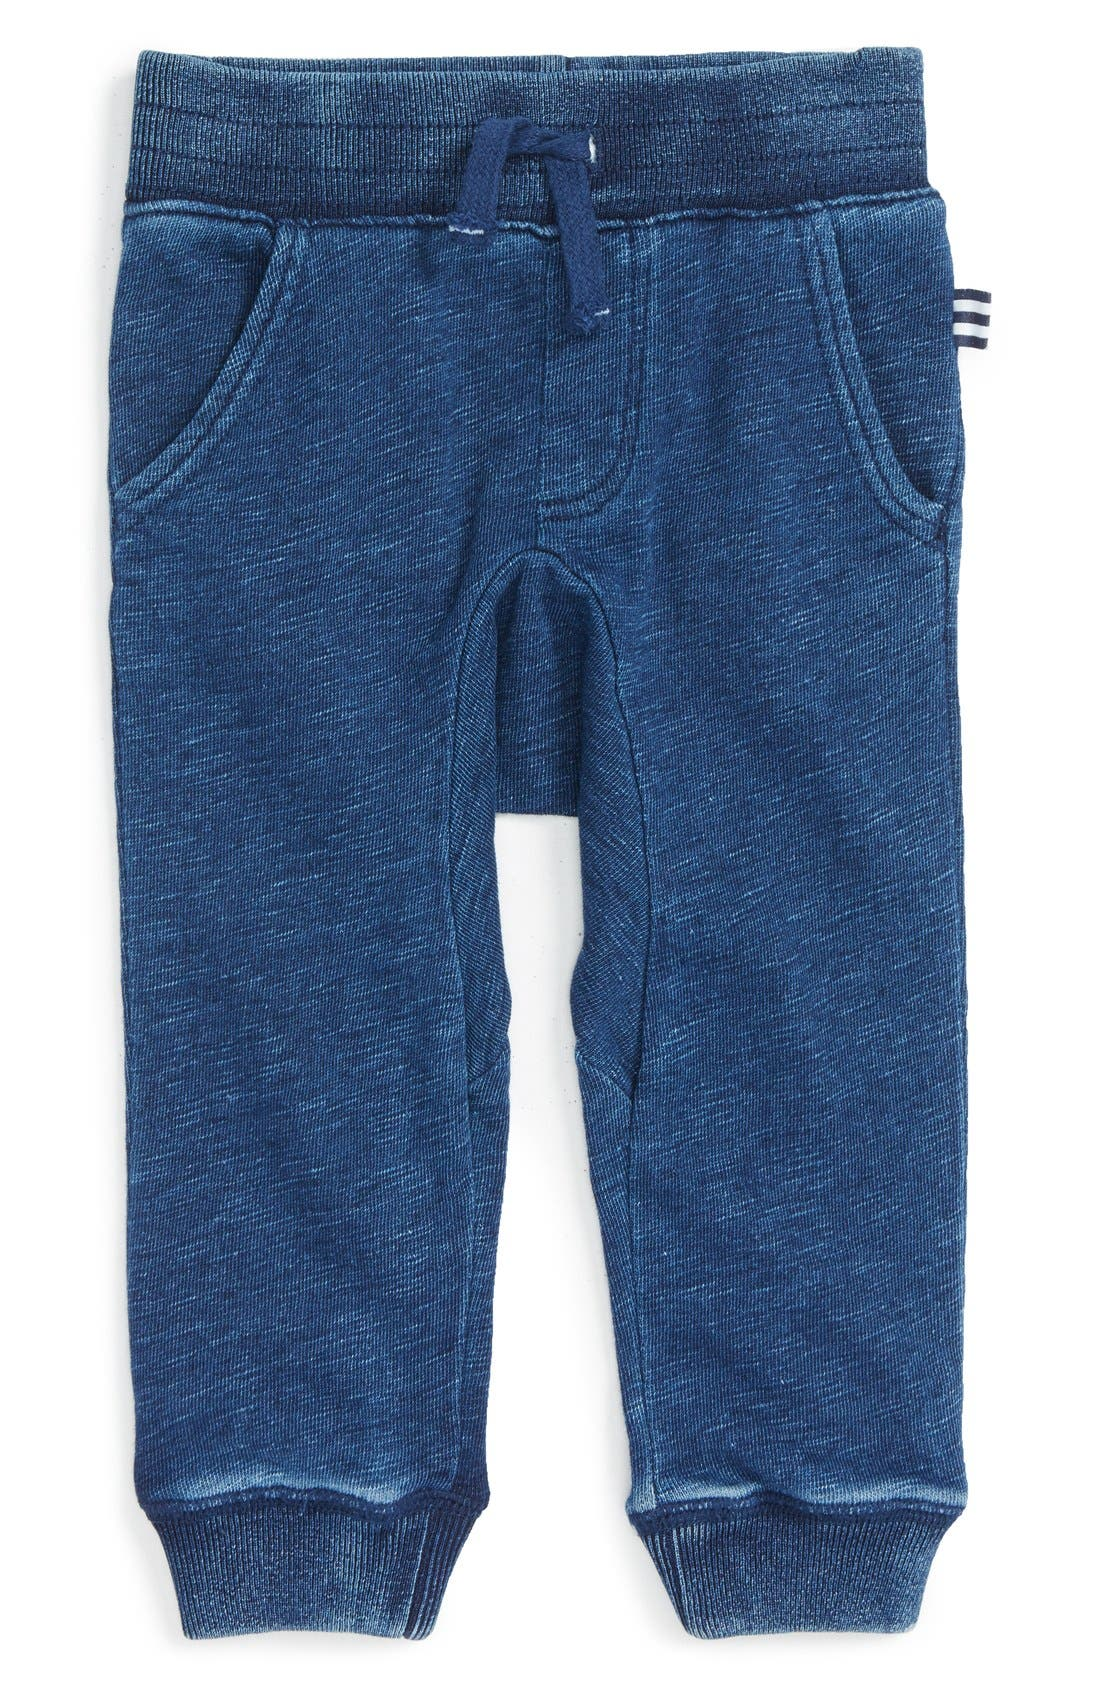 Alternate Image 1 Selected - Splendid Cotton Blend Jogger Pants (Baby Boys)